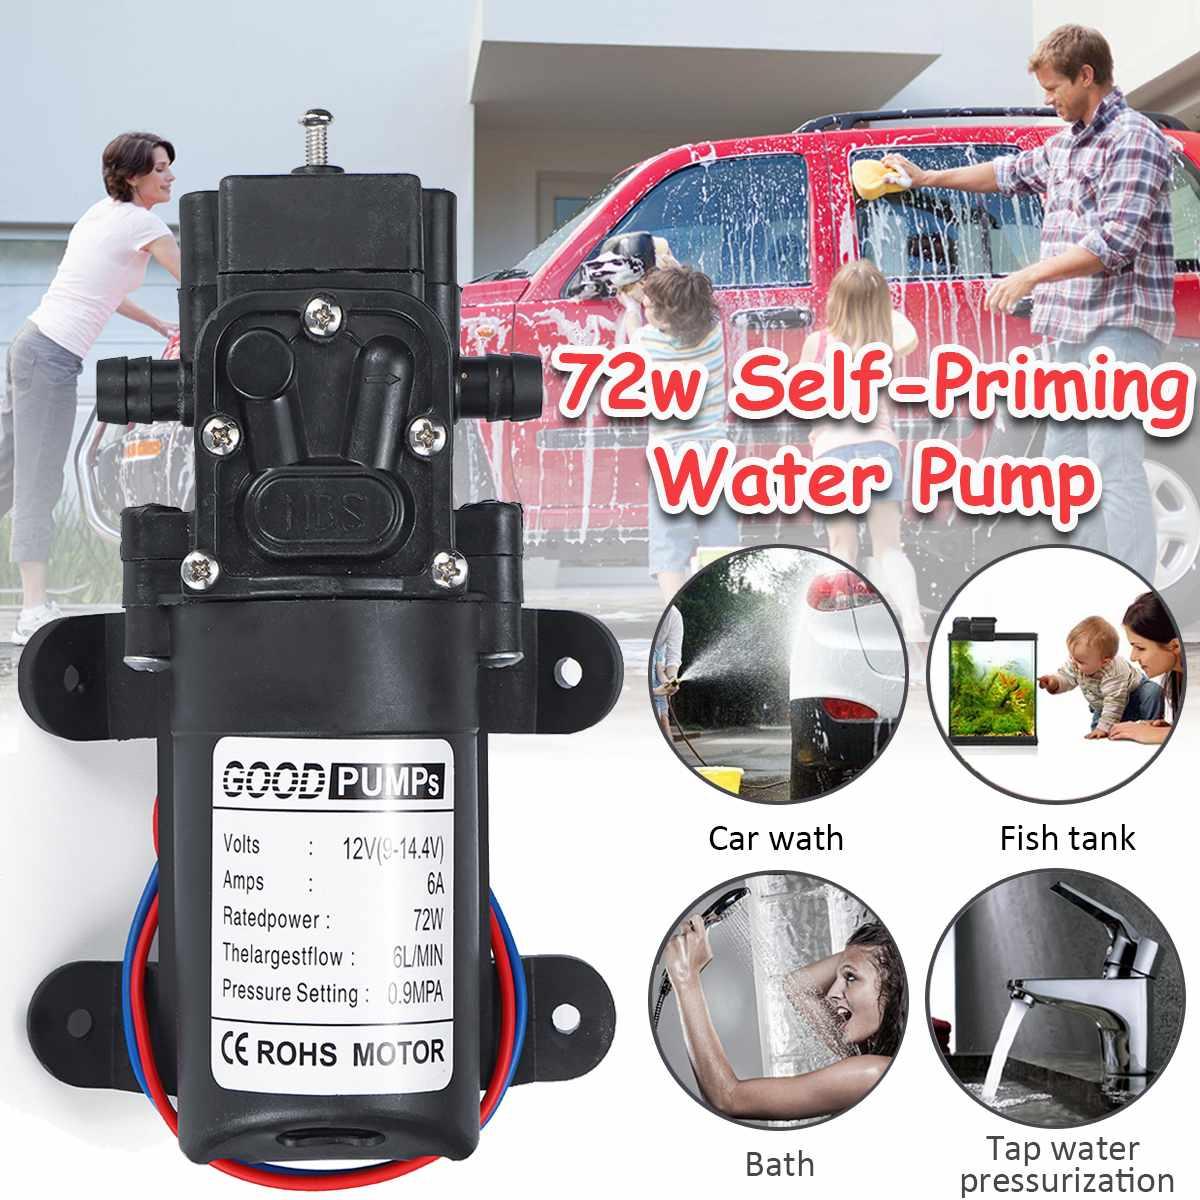 Bomba de lavado de coche con interruptor automático de diafragma pequeño Bomba De Agua De Alta Presión de 12V 6 l/min bomba pulverizadora de riego agrícola de 10mm